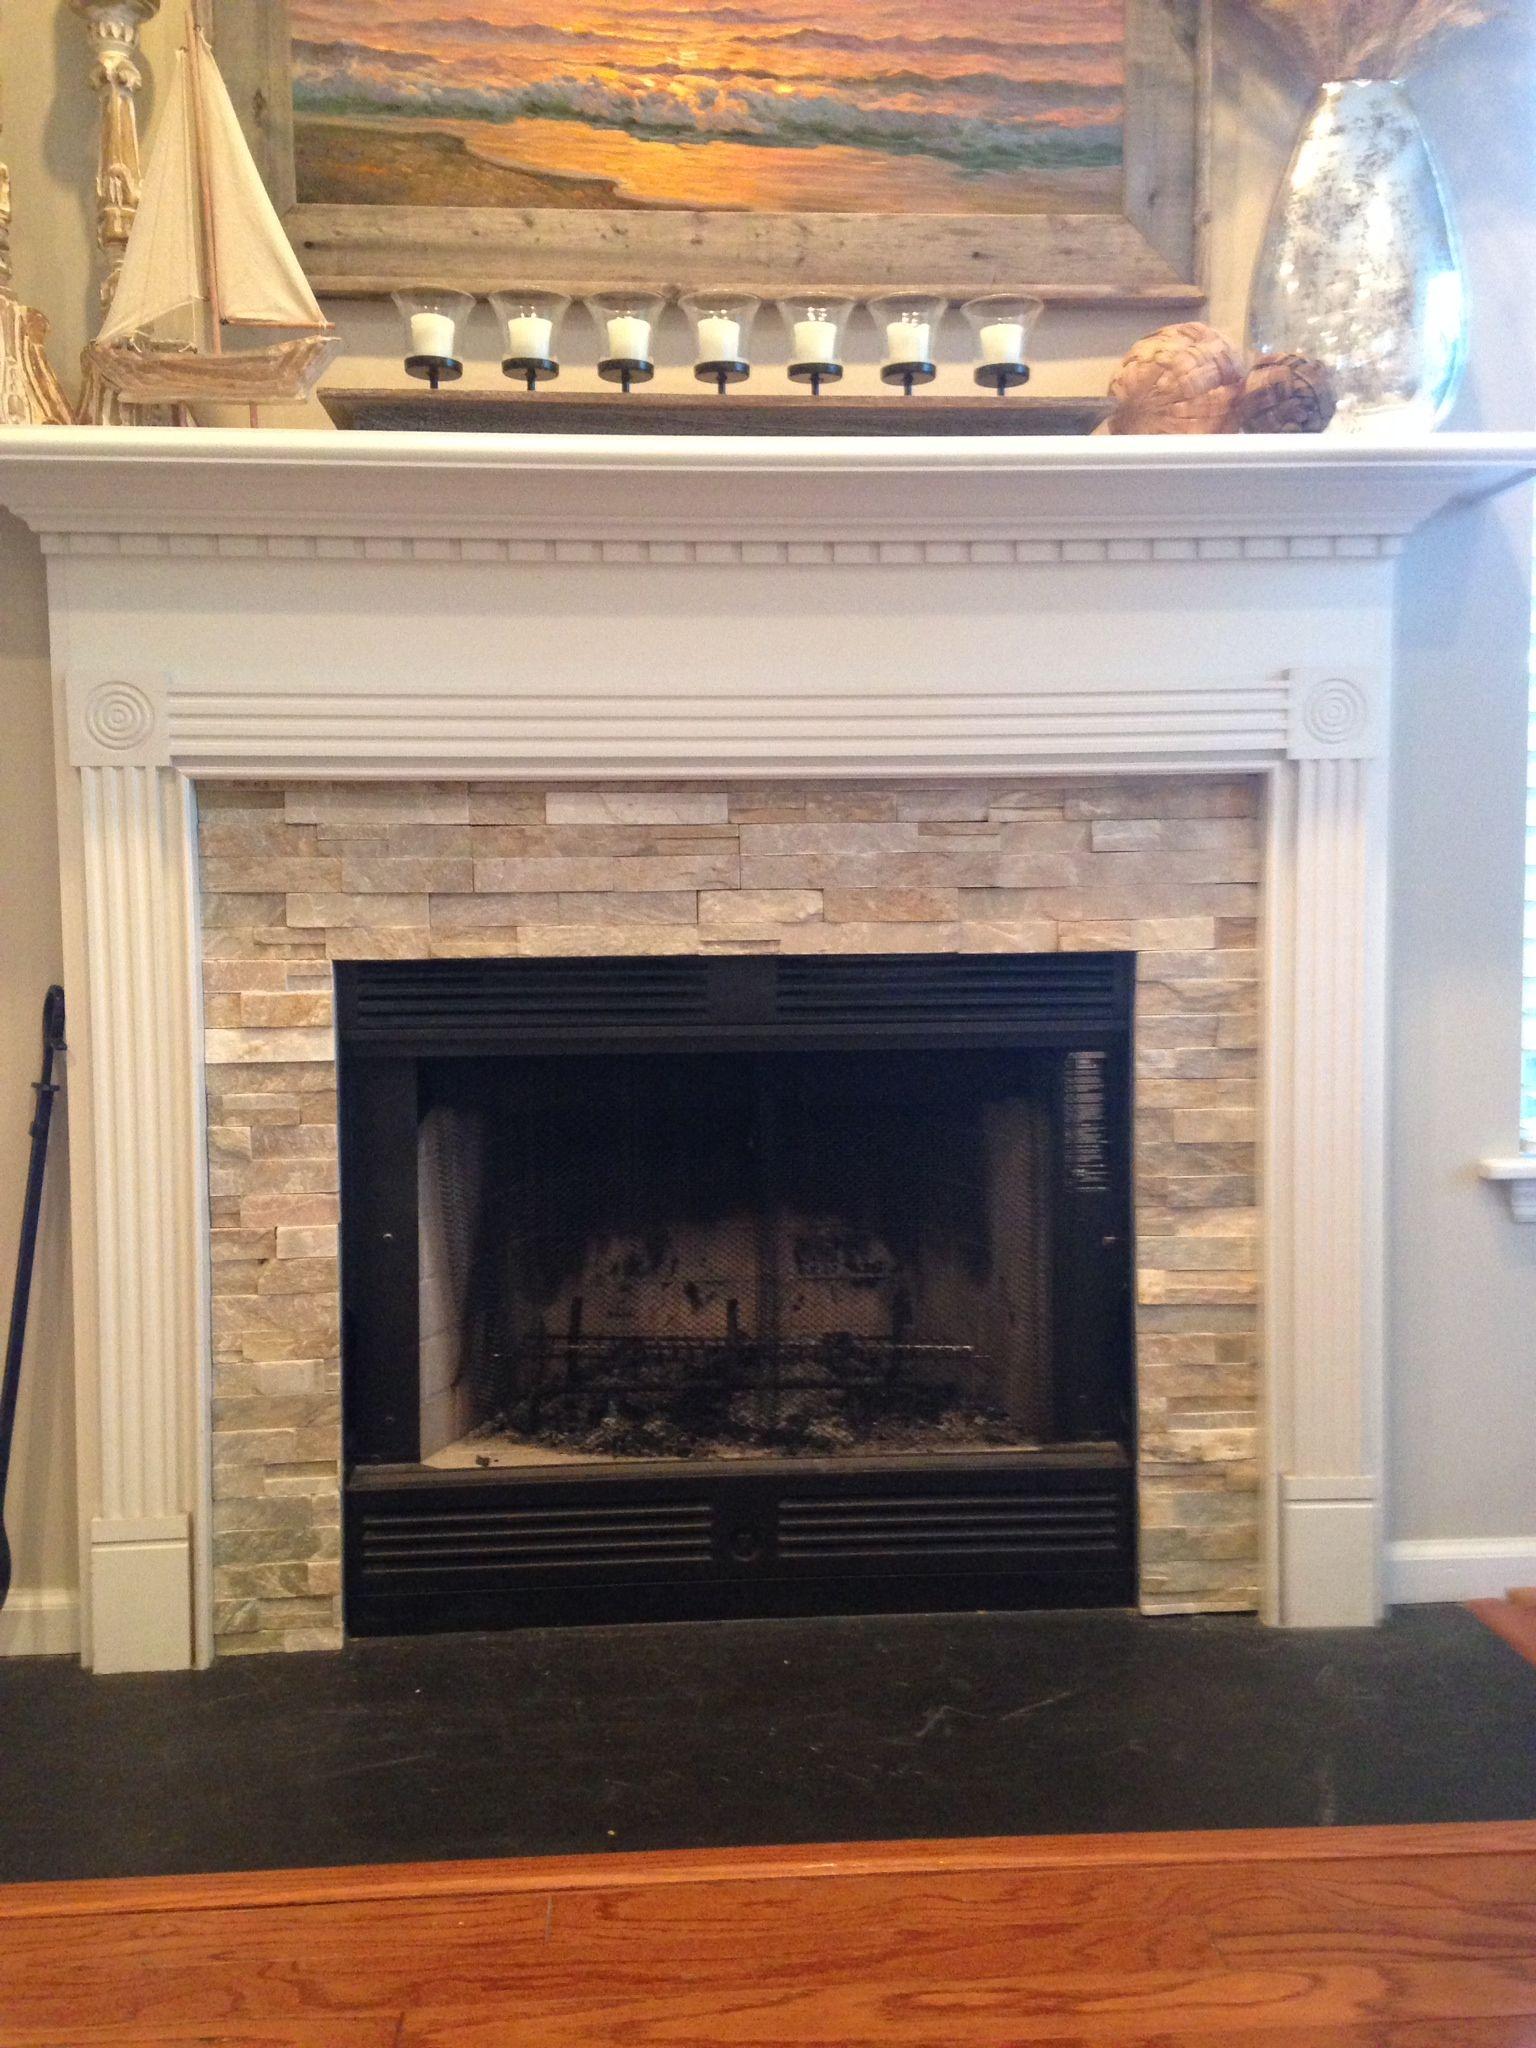 Fmi Fireplace New Fireplace Idea Mantel Wainscoting Design Craftsman